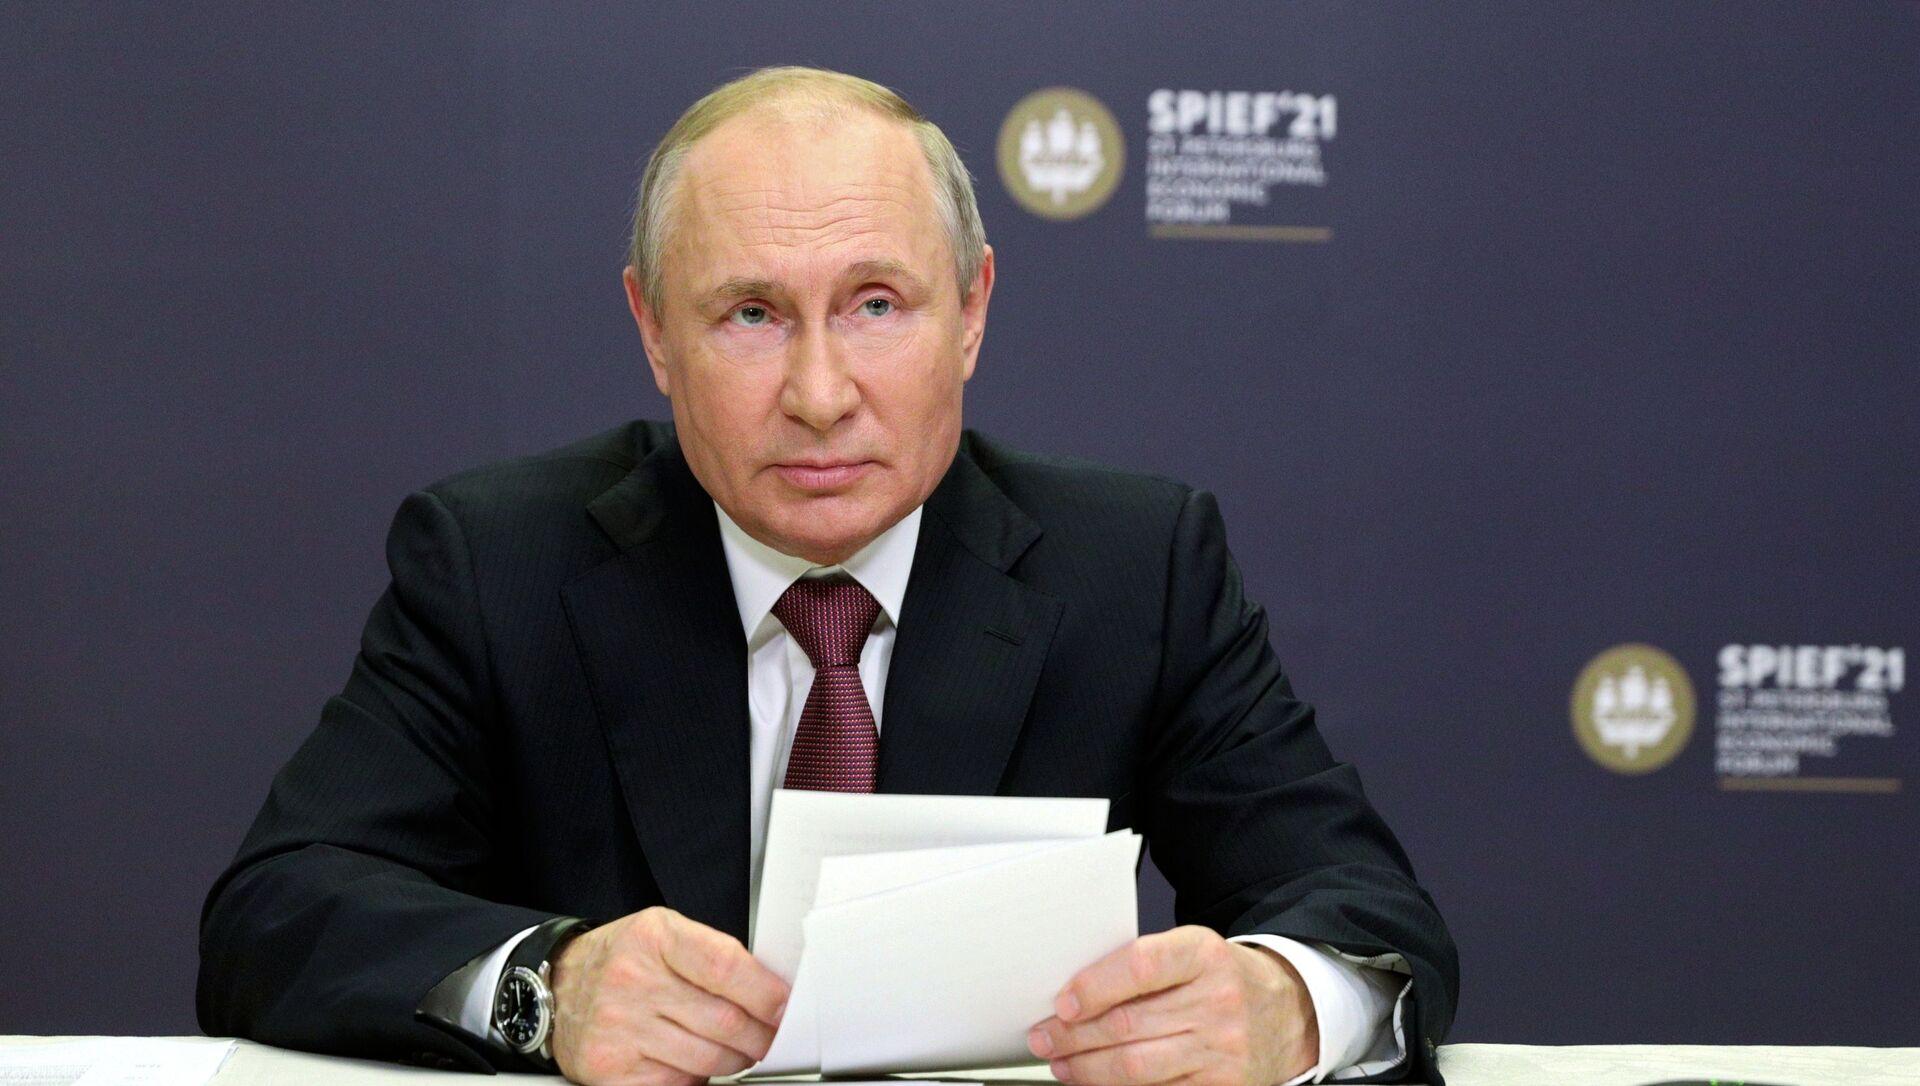 Президент РФ Владимир Путин, фото из архива - Sputnik Азербайджан, 1920, 03.06.2021